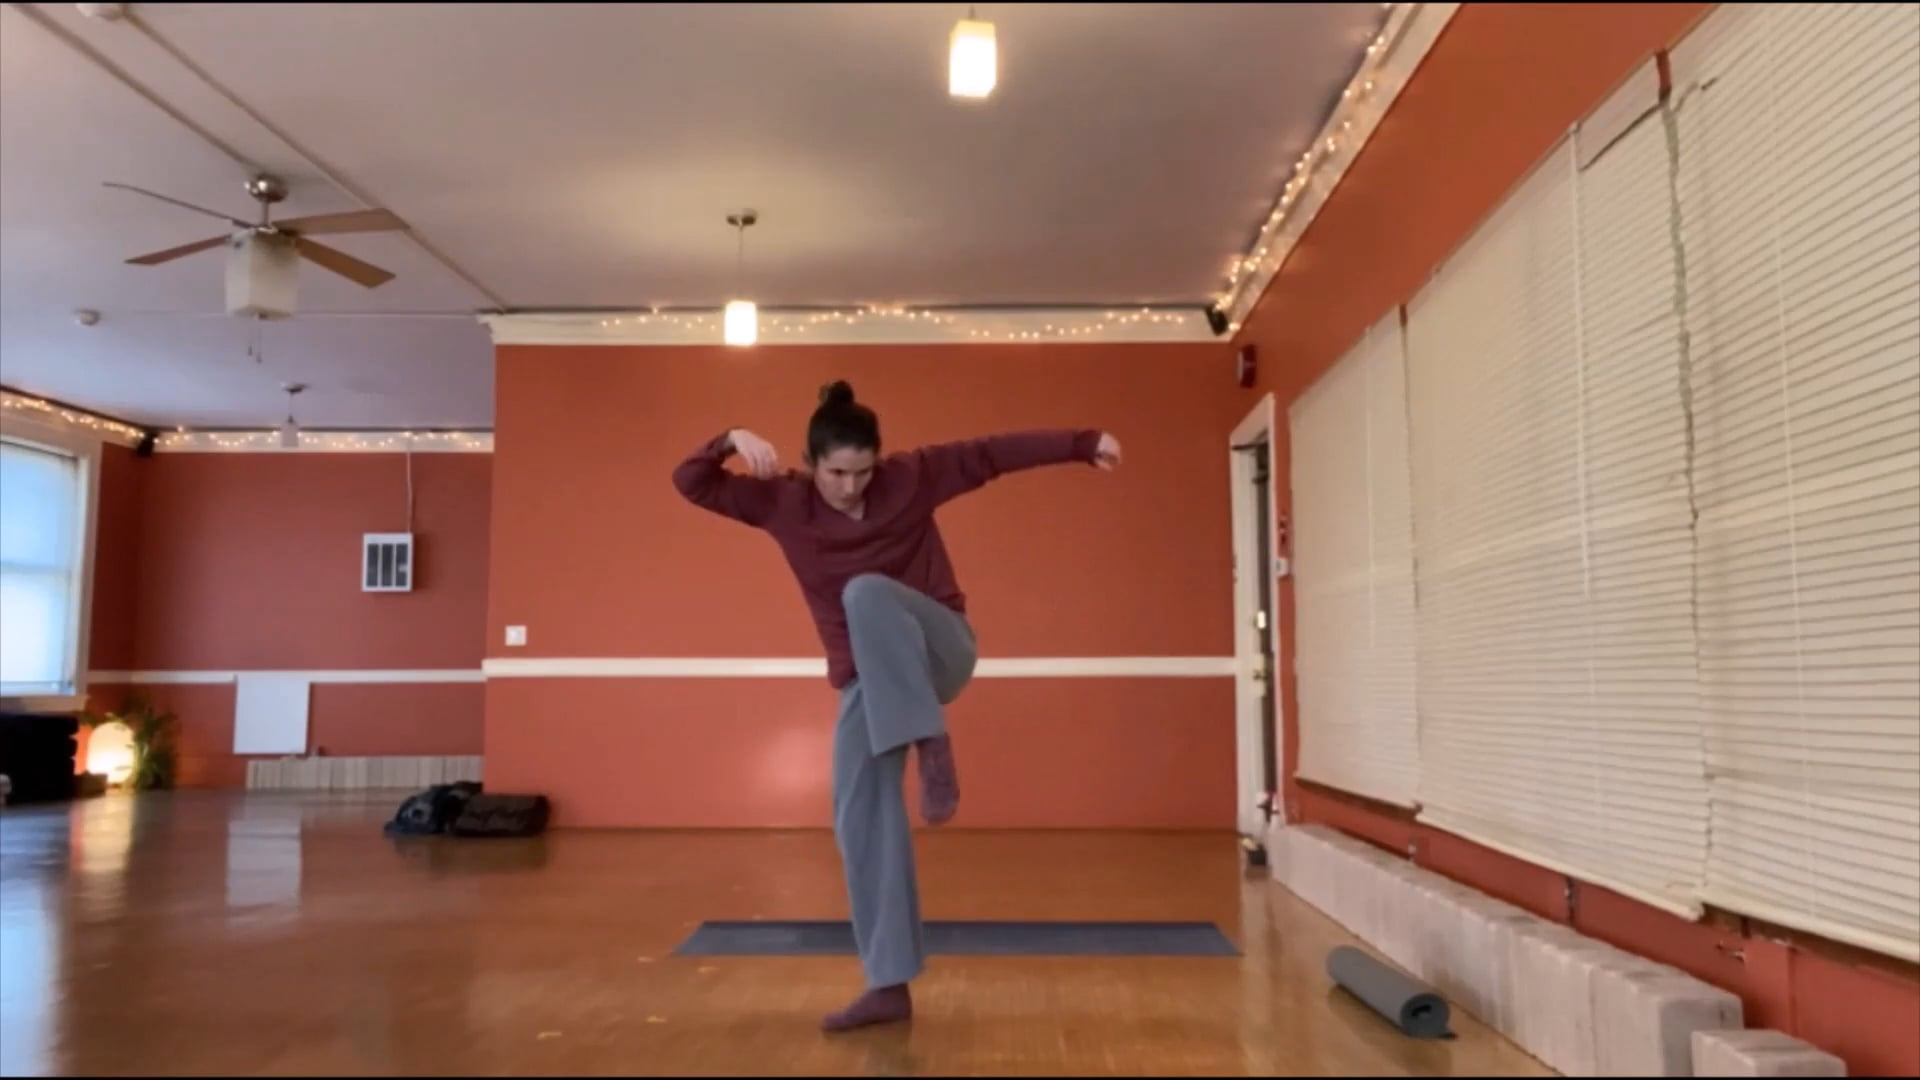 A Tidy Dance